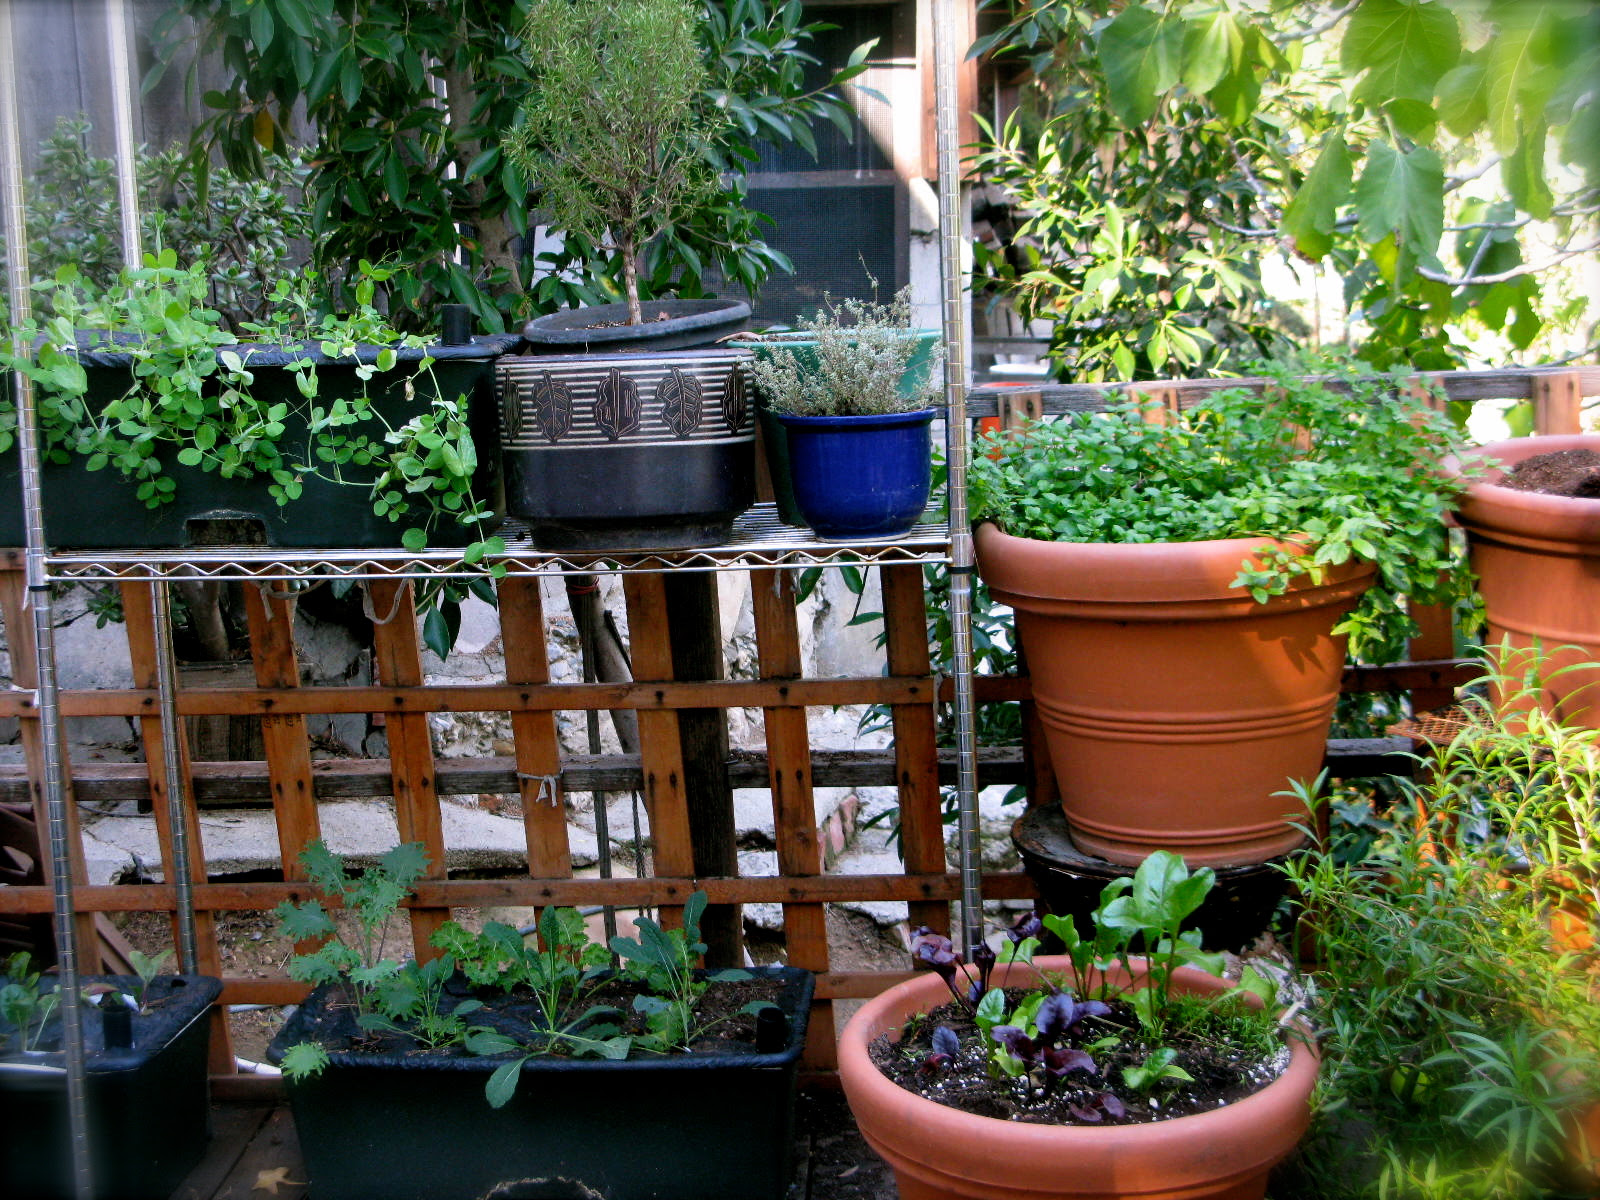 My Patio Farm | An urban gardener grows in LA